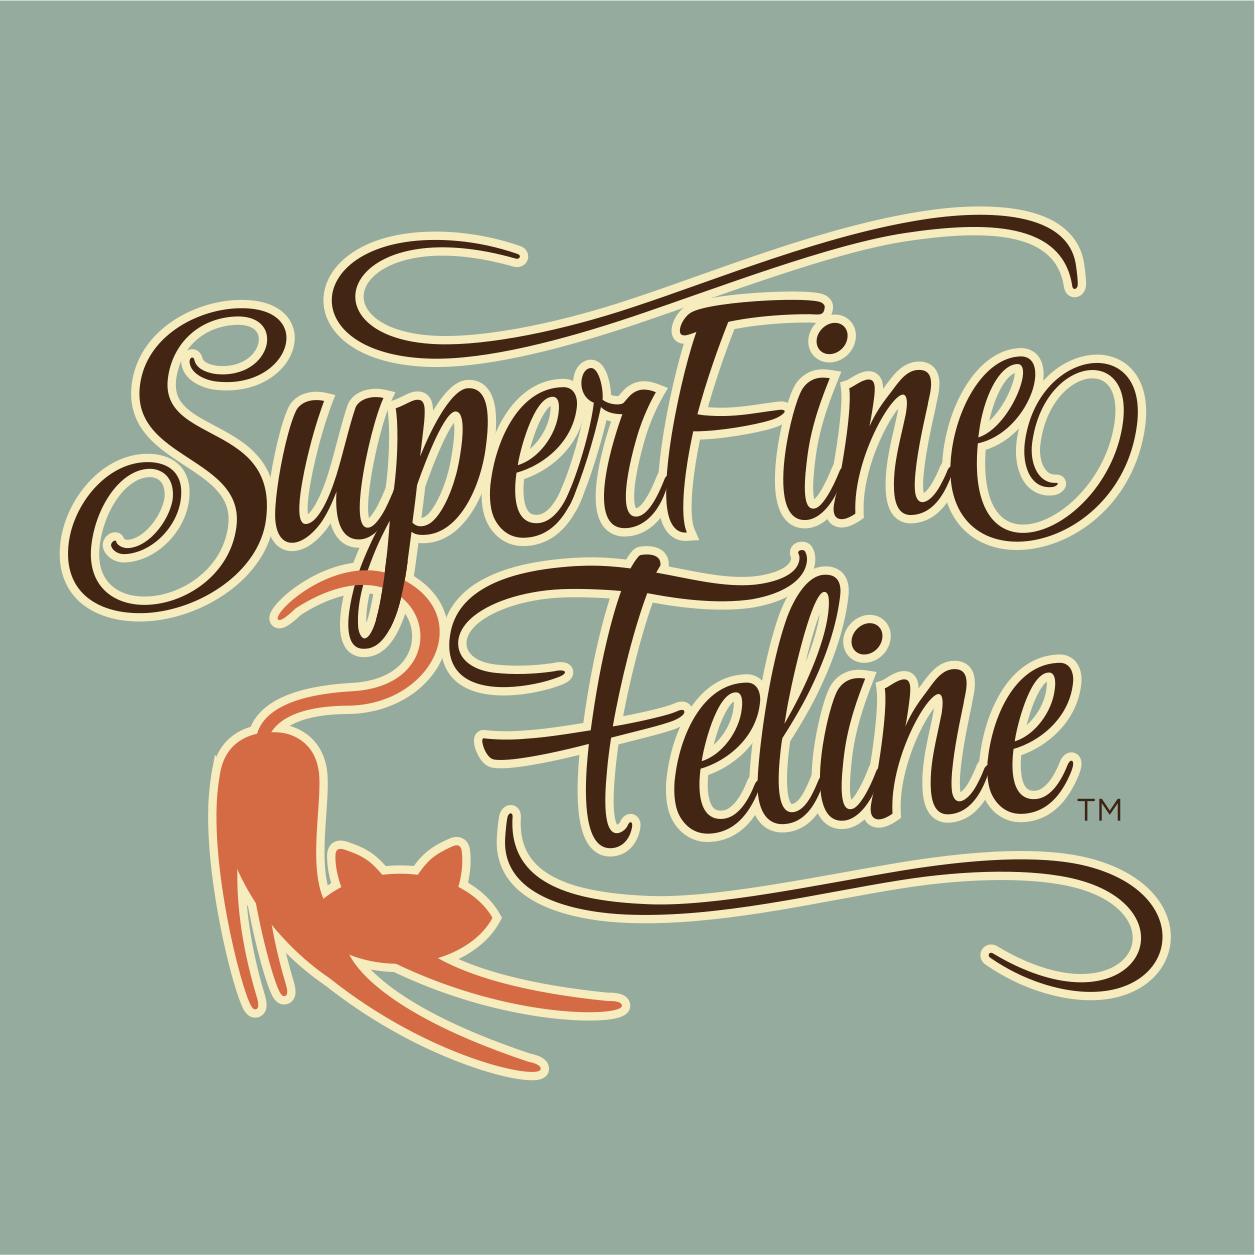 SuperFineFeline was a nickname a close friend gave me many years ago.